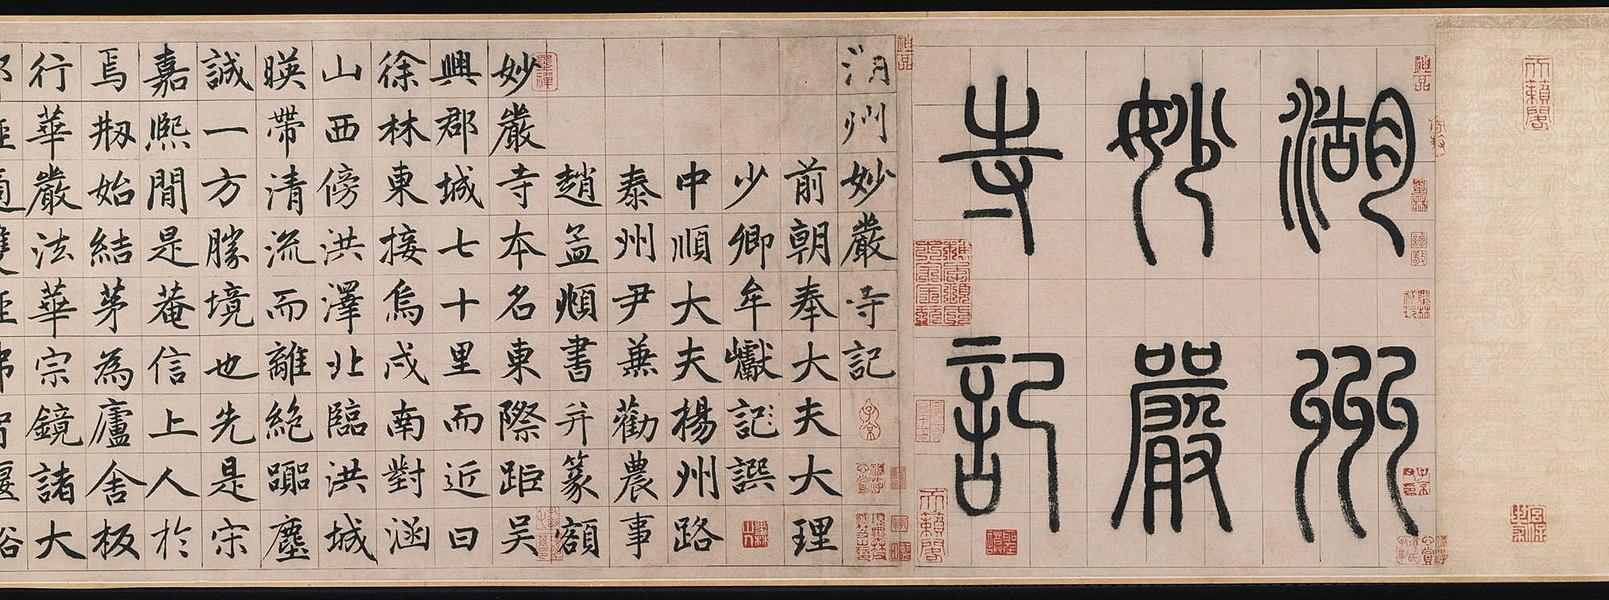 zhao mengfu - image 2